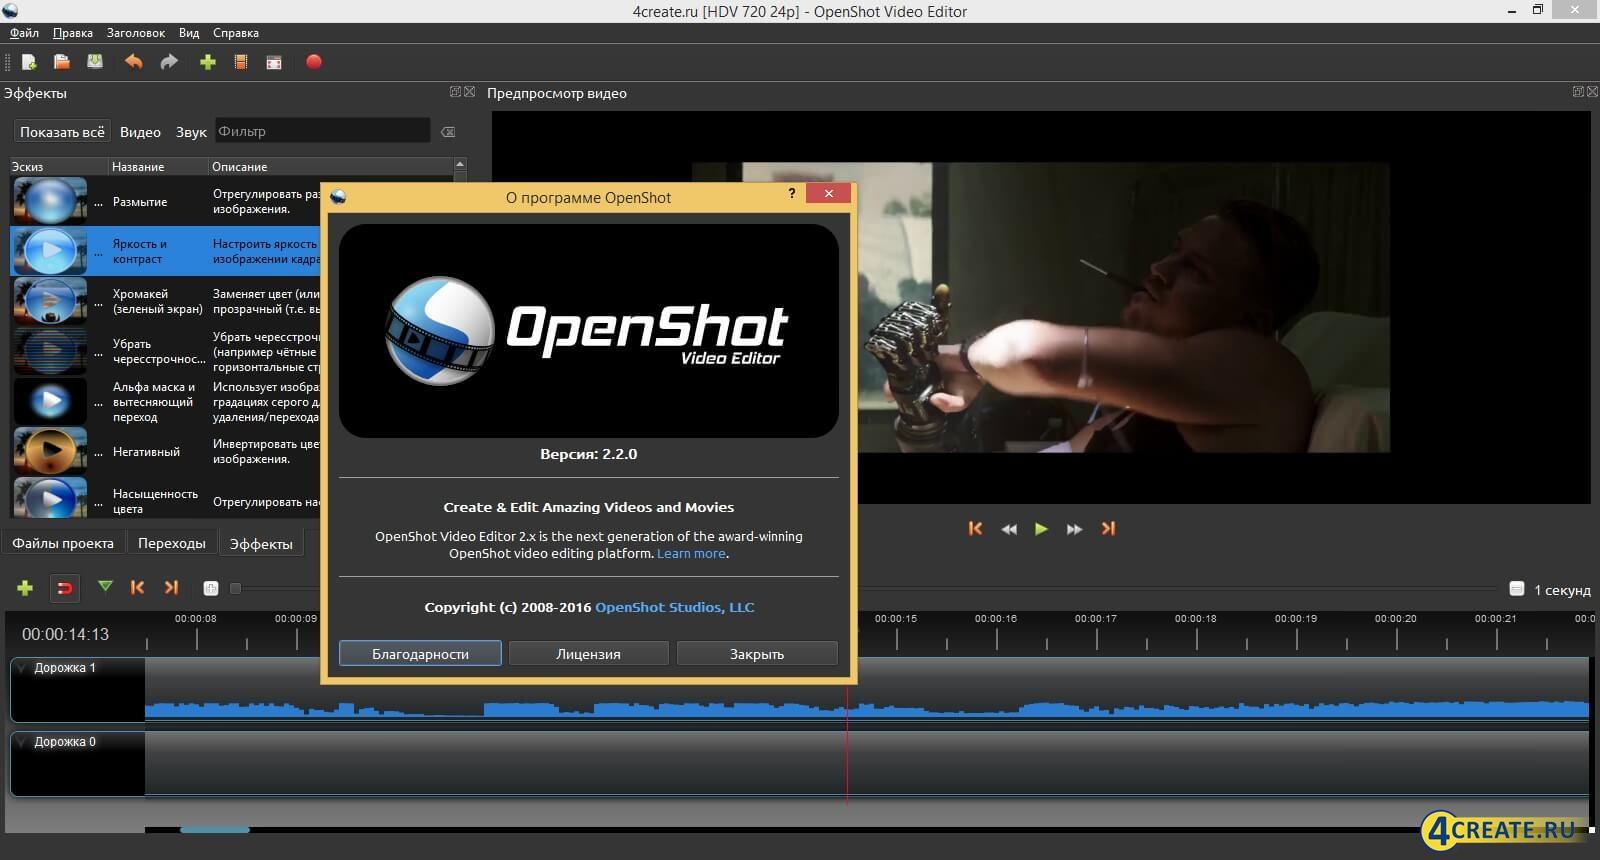 OpenShot Video Editor 2.2 (Скриншот 1)